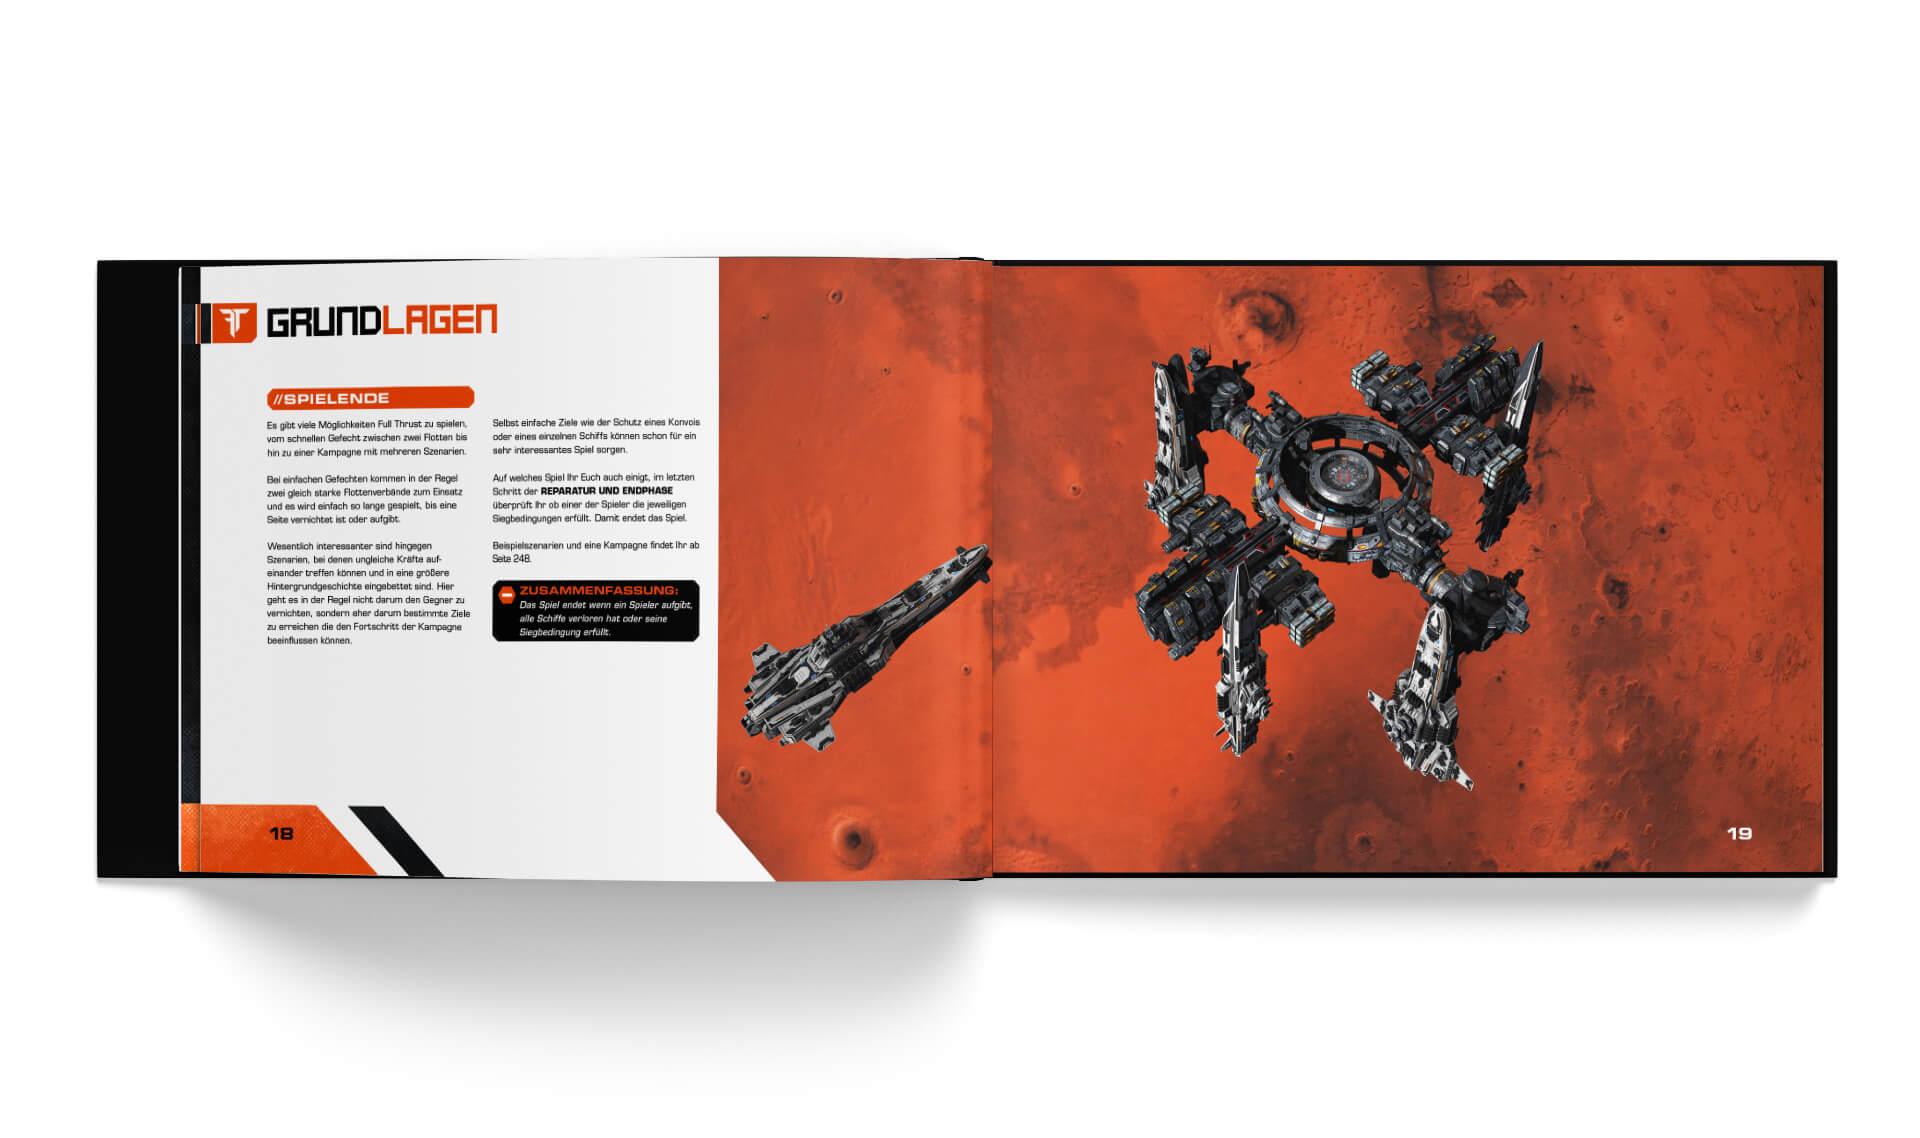 Freybutjer Full Thrust Admirals Handbook